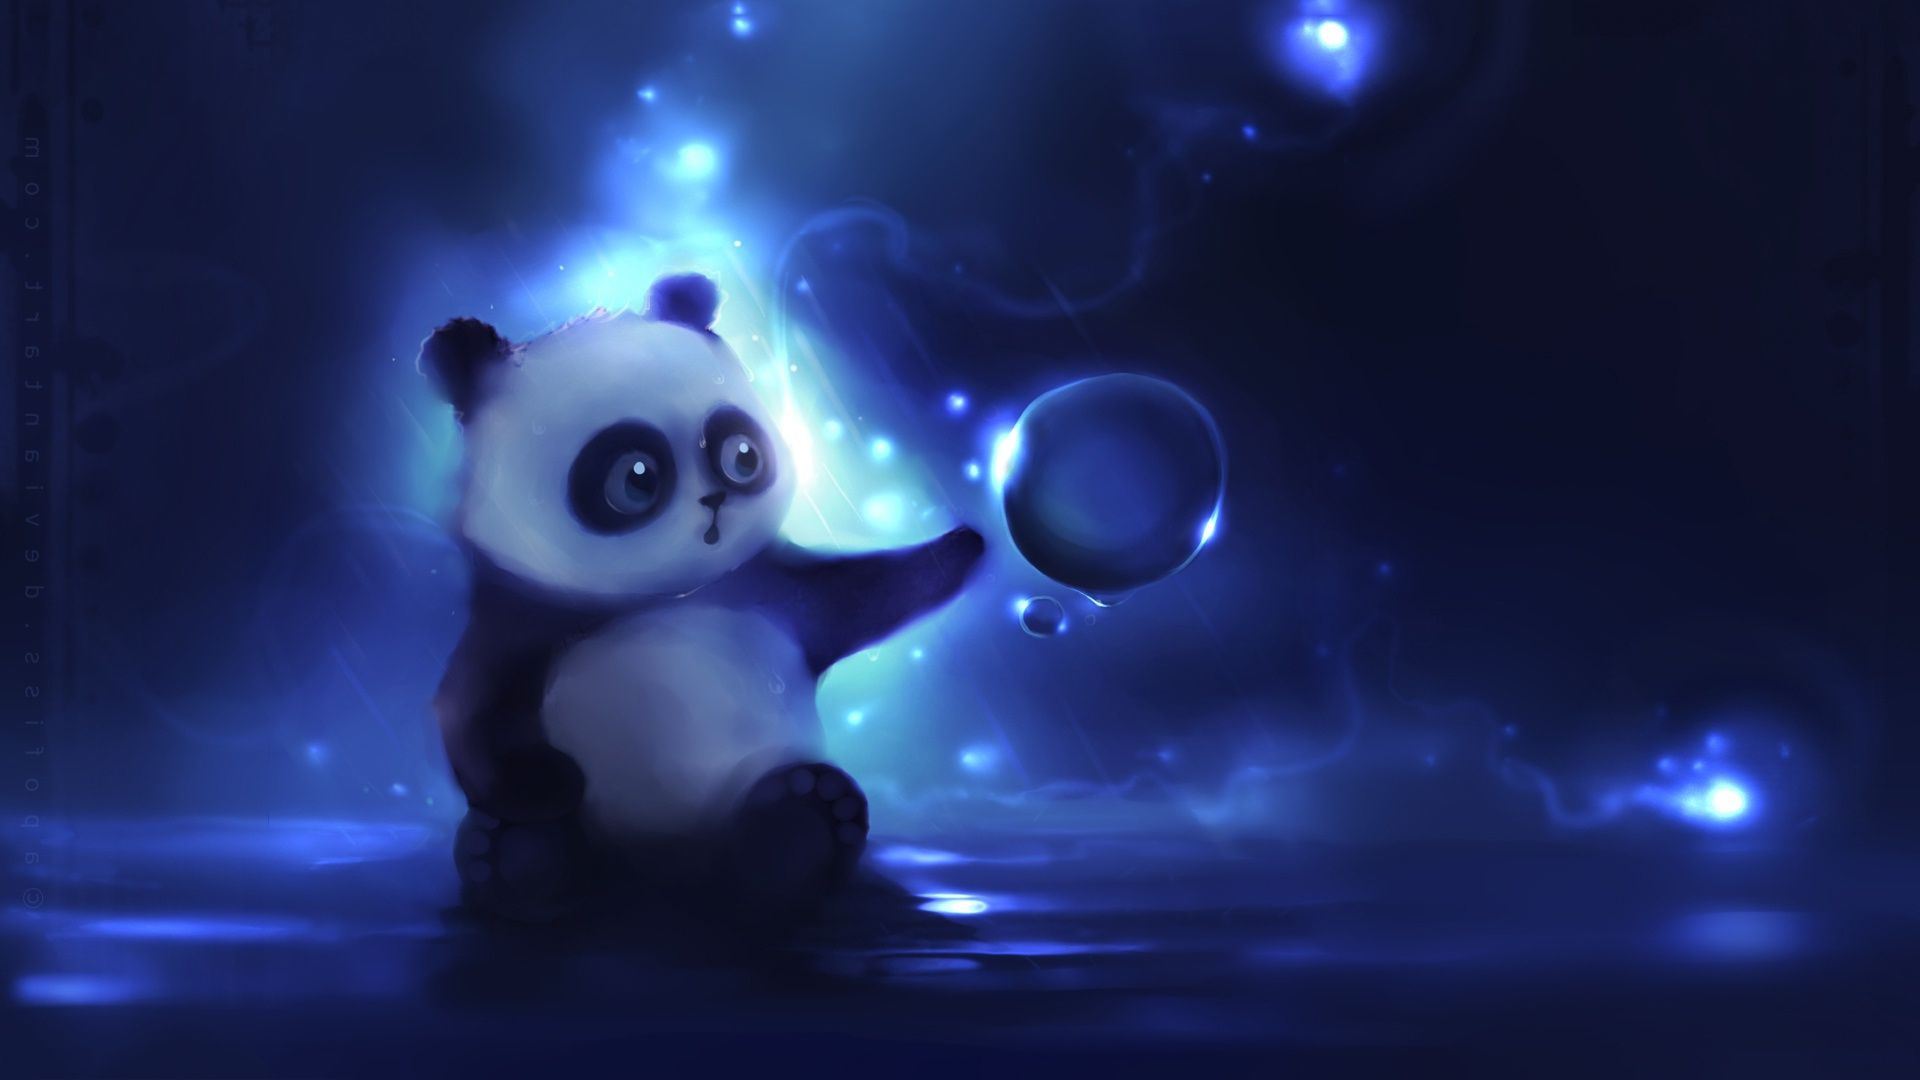 Cool Panda Wallpapers Top Free Cool Panda Backgrounds Wallpaperaccess